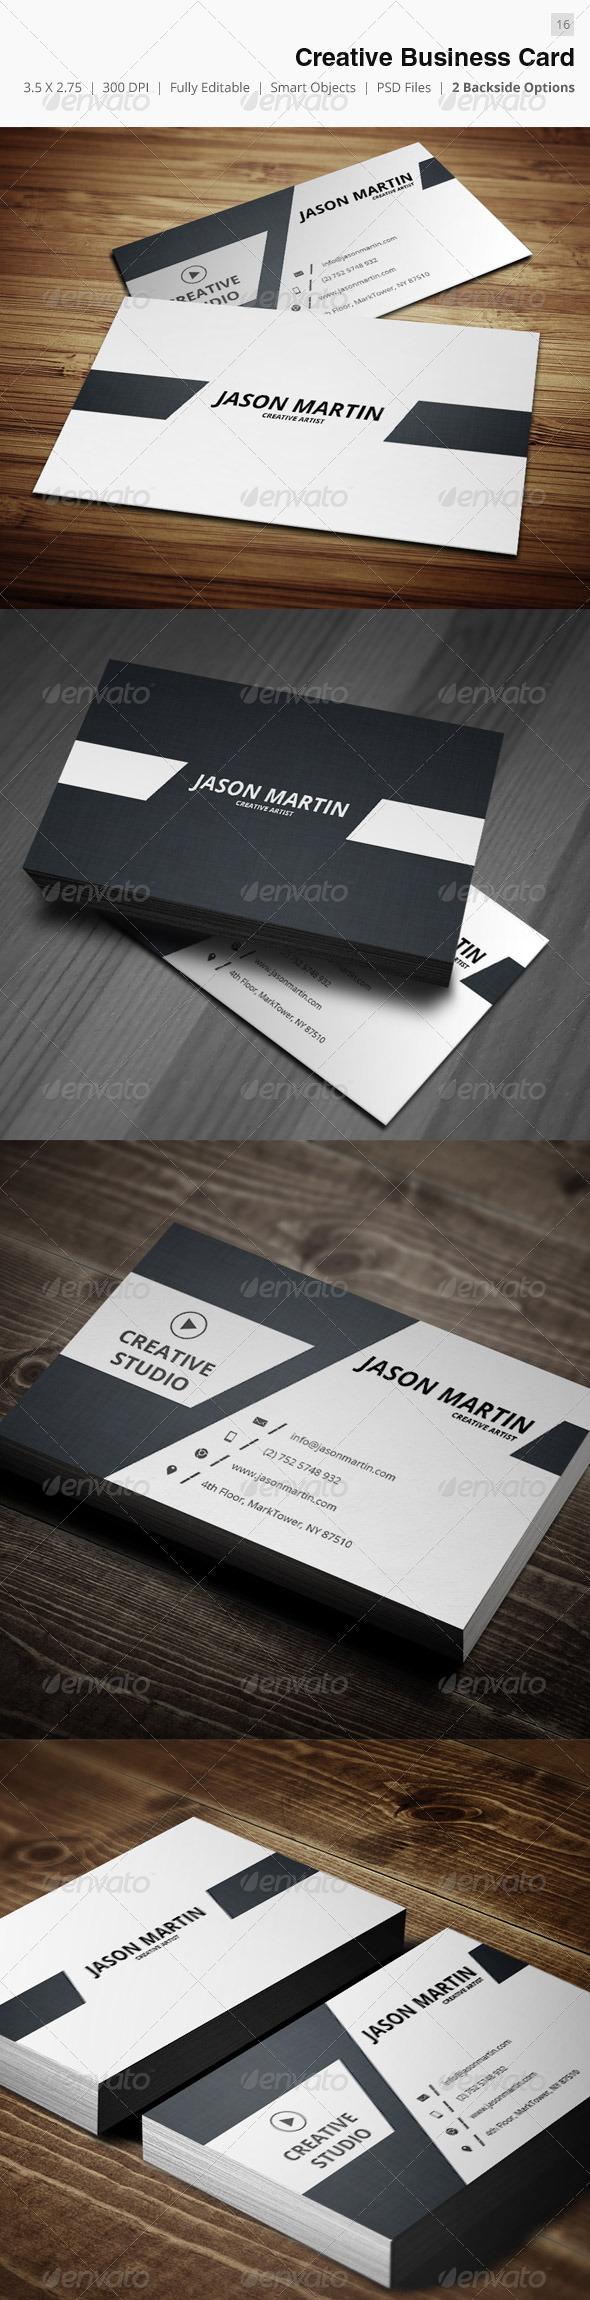 Creative Business Card - 16 - Creative Business Cards